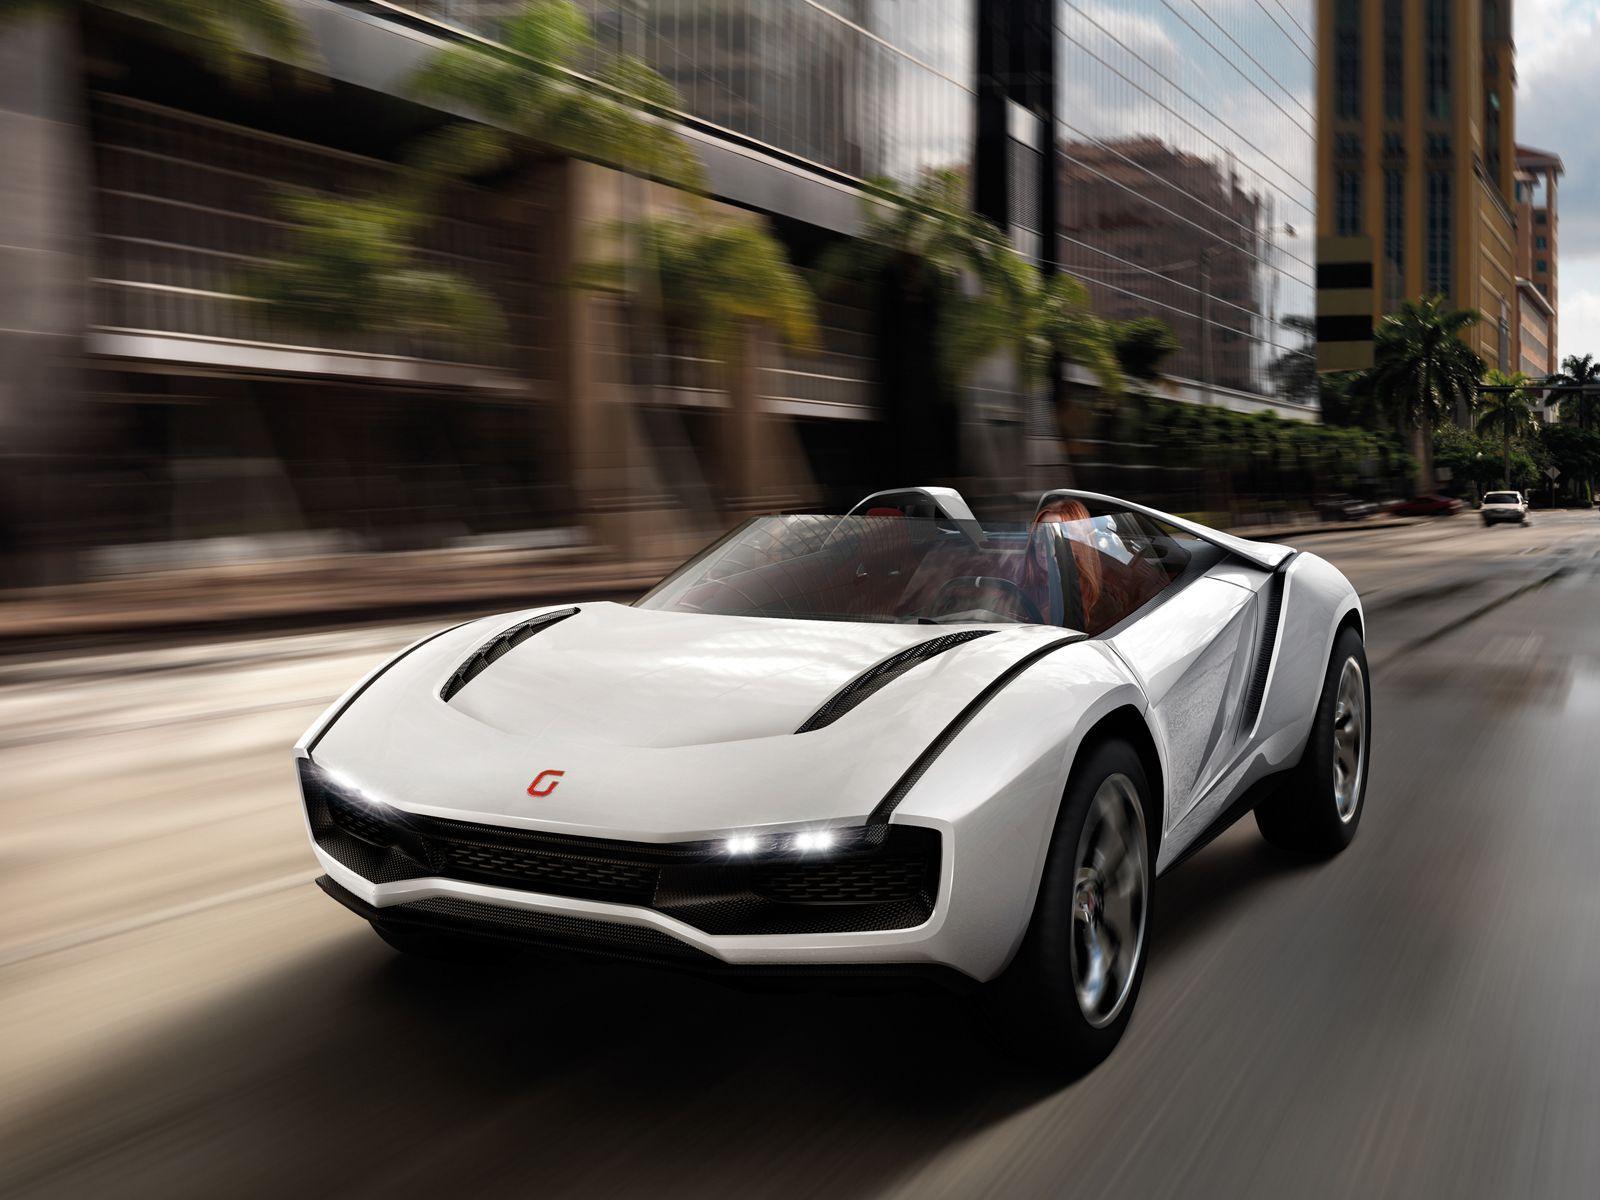 2013 Italdesign Giugiaro Parcour Roadster Concept cars